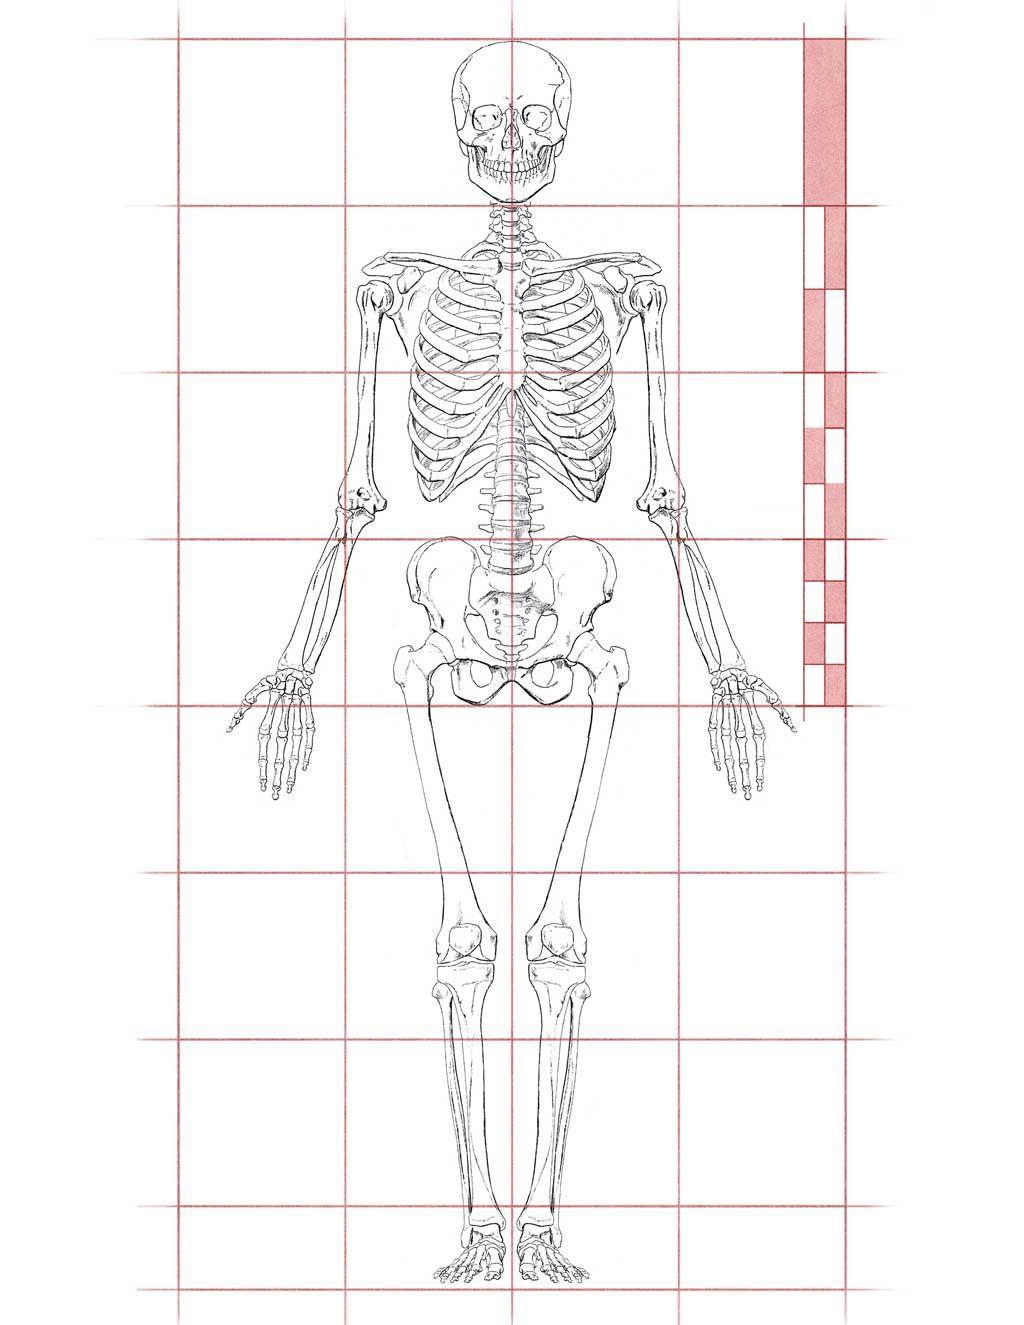 medium resolution of artistic anatomy dr paul richer skeletal study 7 1 2 head proportion study artstudy artanatomy humanproportion proportion skeleton hartman